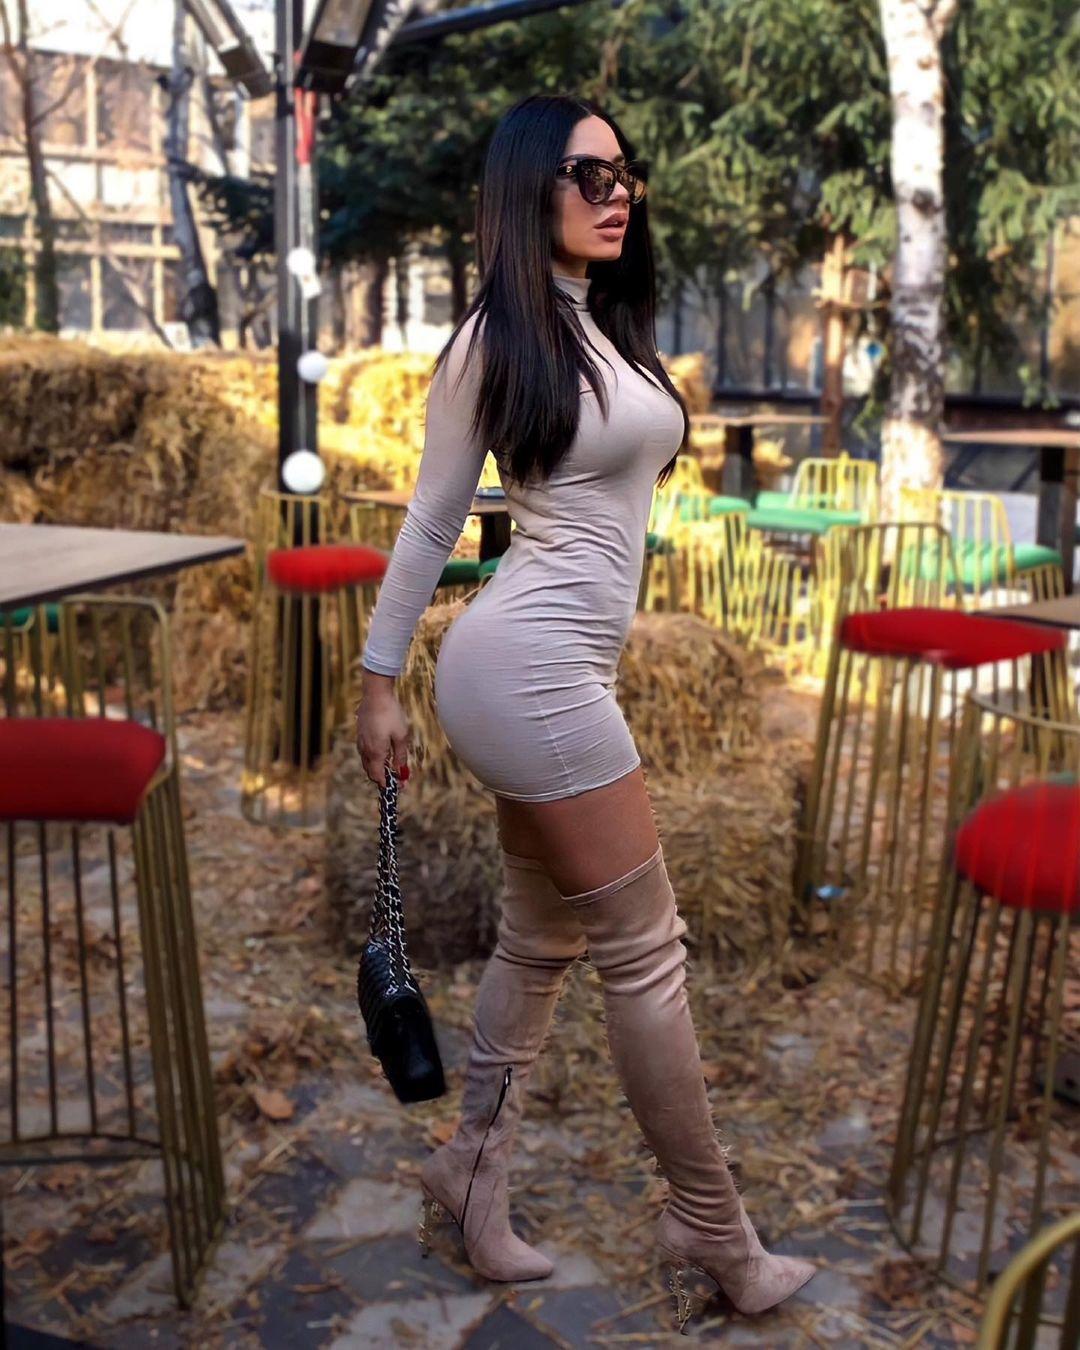 Andrea-Coco-Wallpapers-Insta-Fit-Bio-6